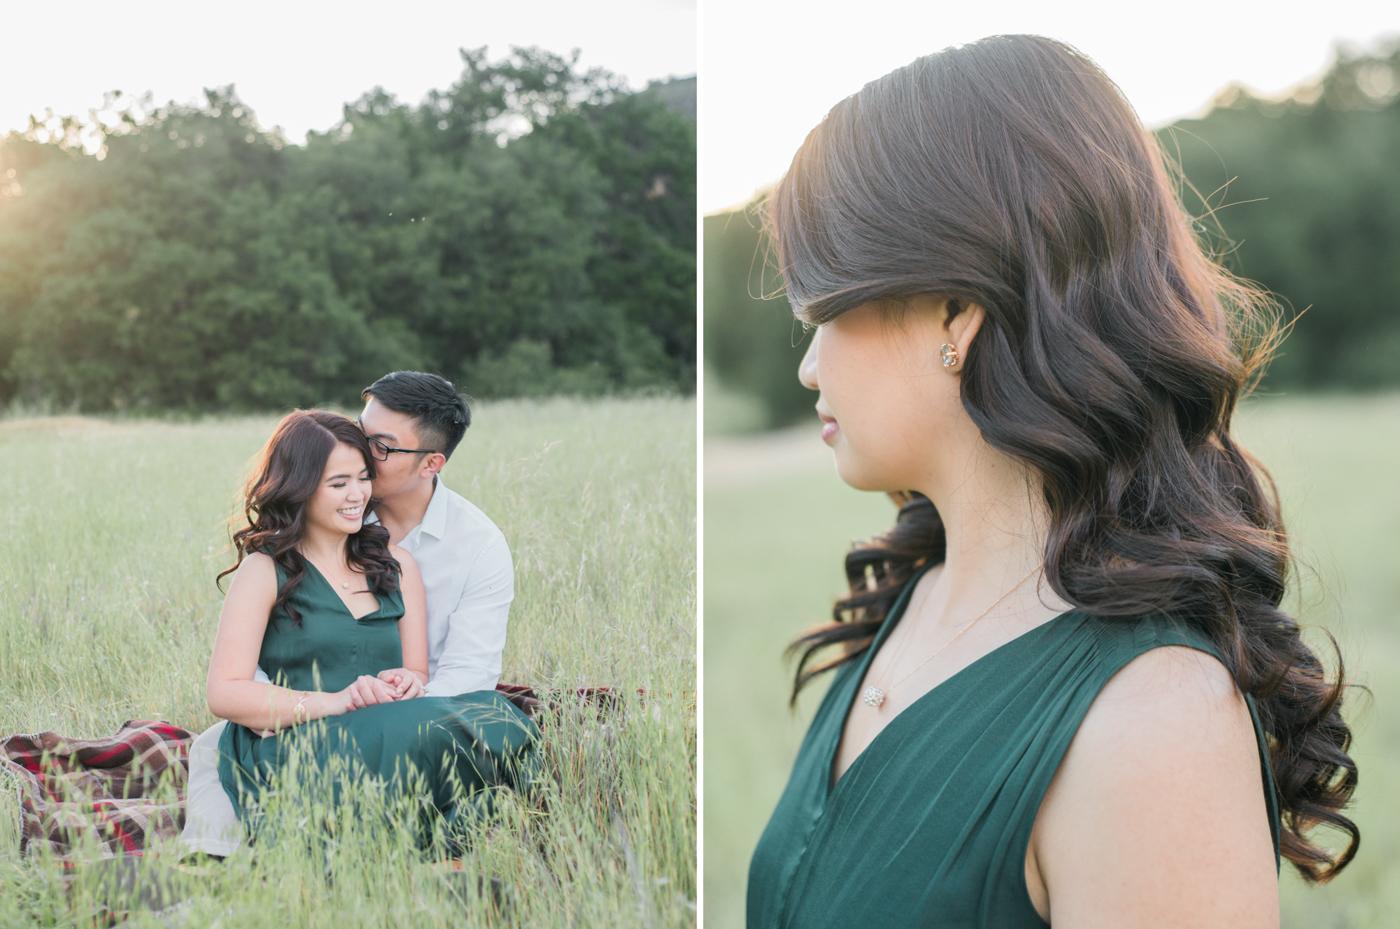 dianne&christian-malibu-creek-state-park-engagement-session-photography-los-angeles-based-wedding-photographer-2.jpg